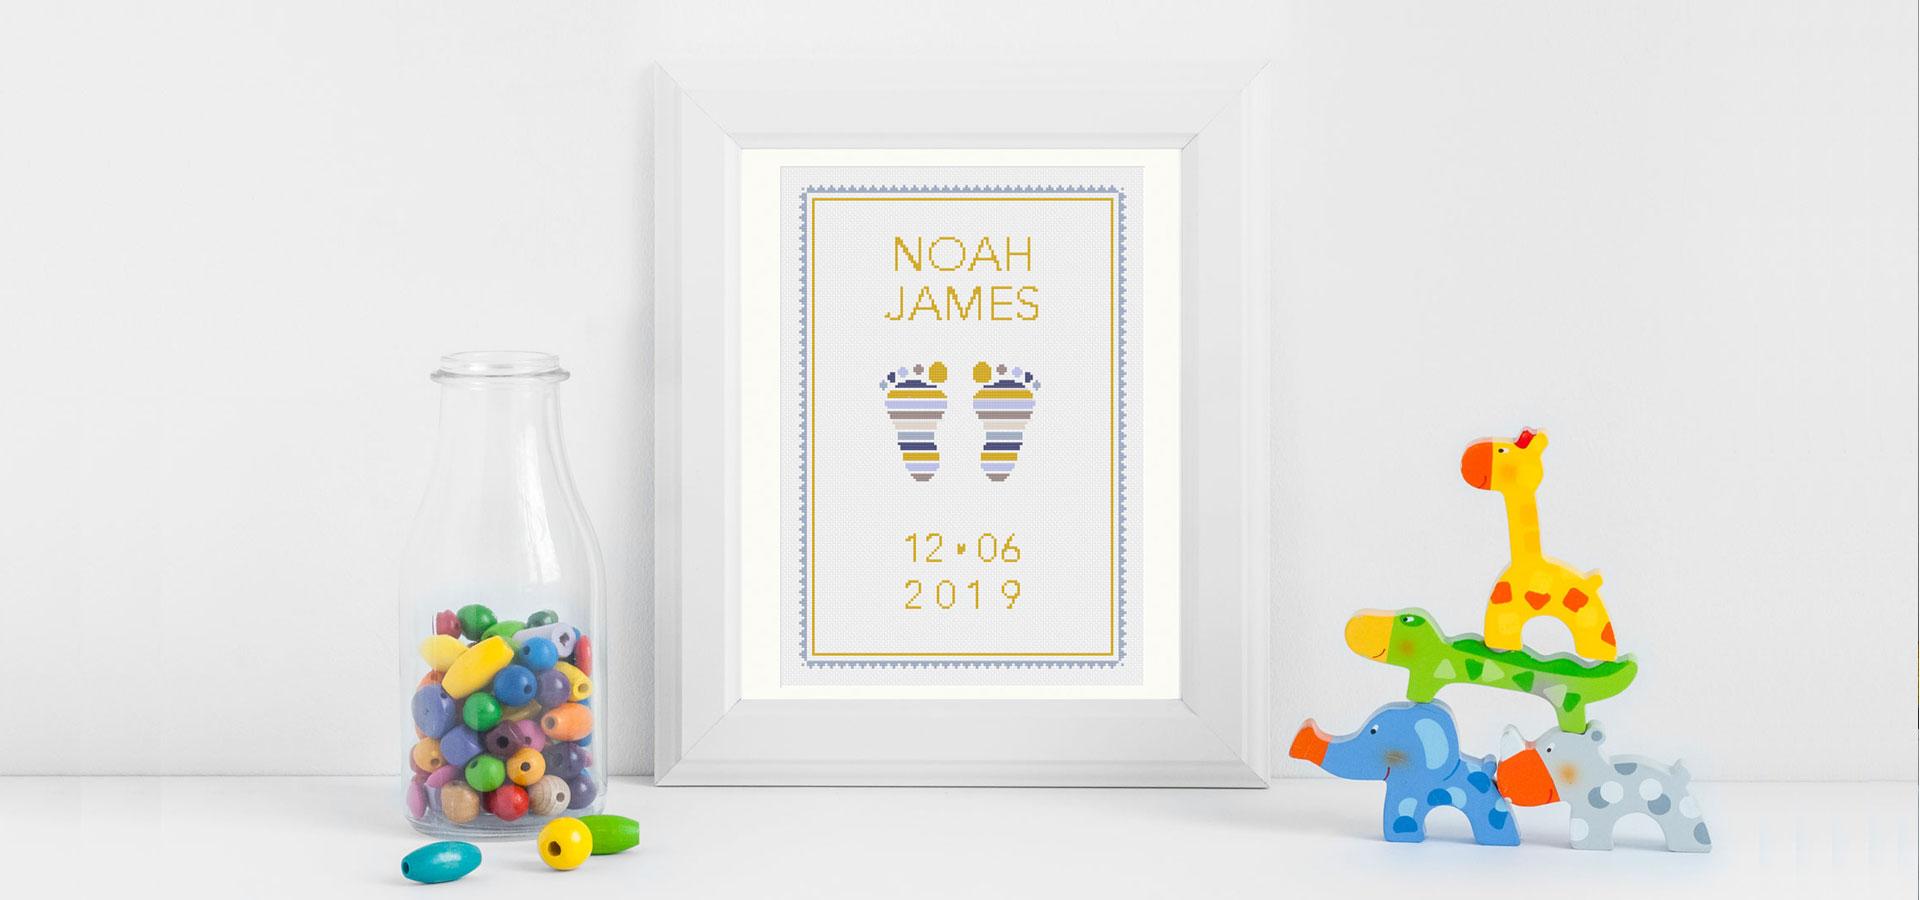 Baby Feet Cross Stitch Pattern showing nursery animals in a banner